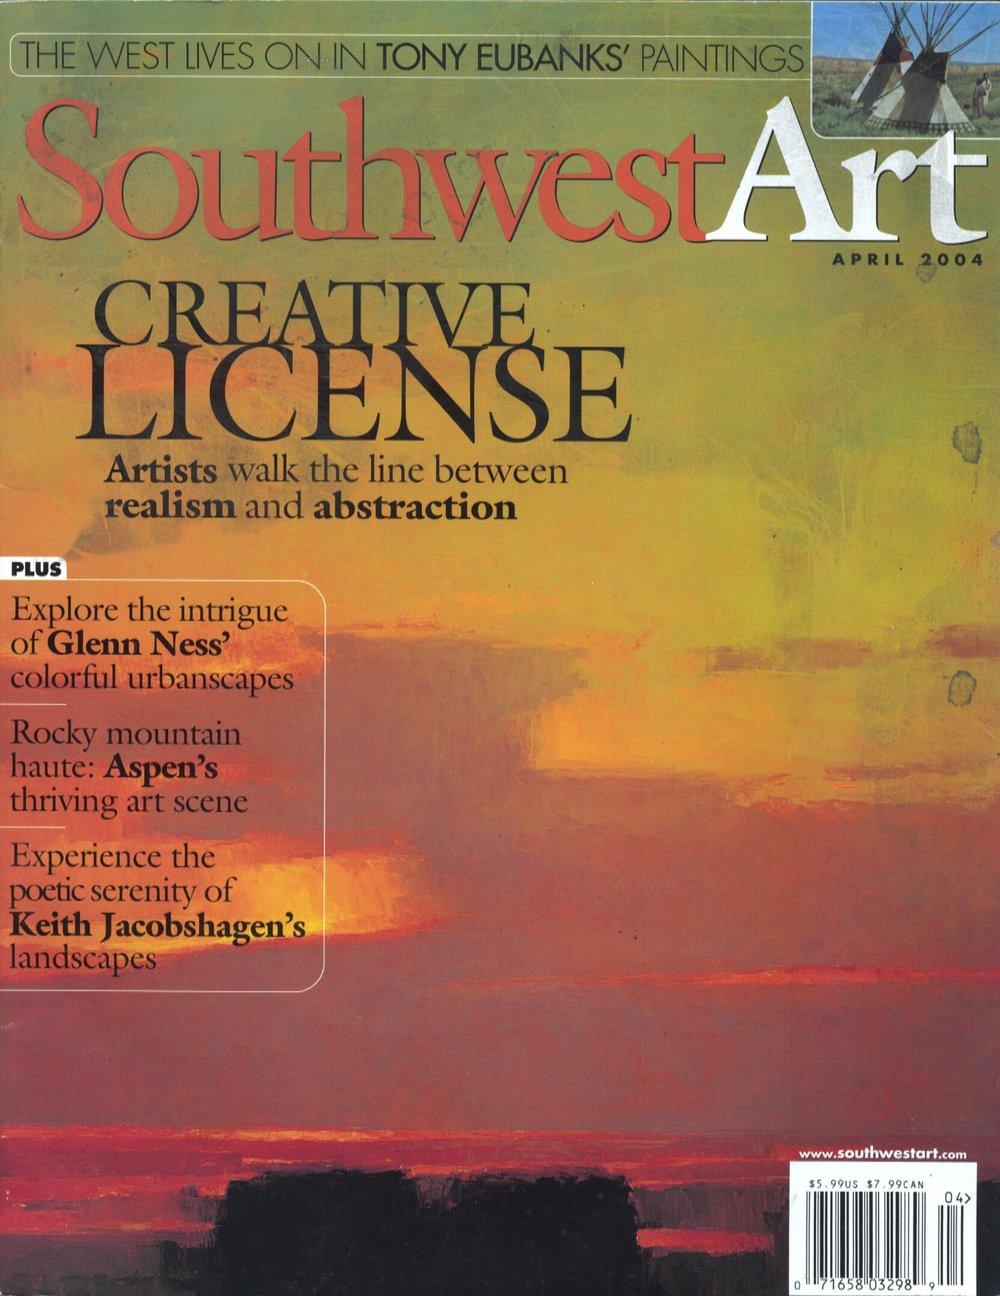 Scan-Mccaw Mag 26 copy 2.jpg